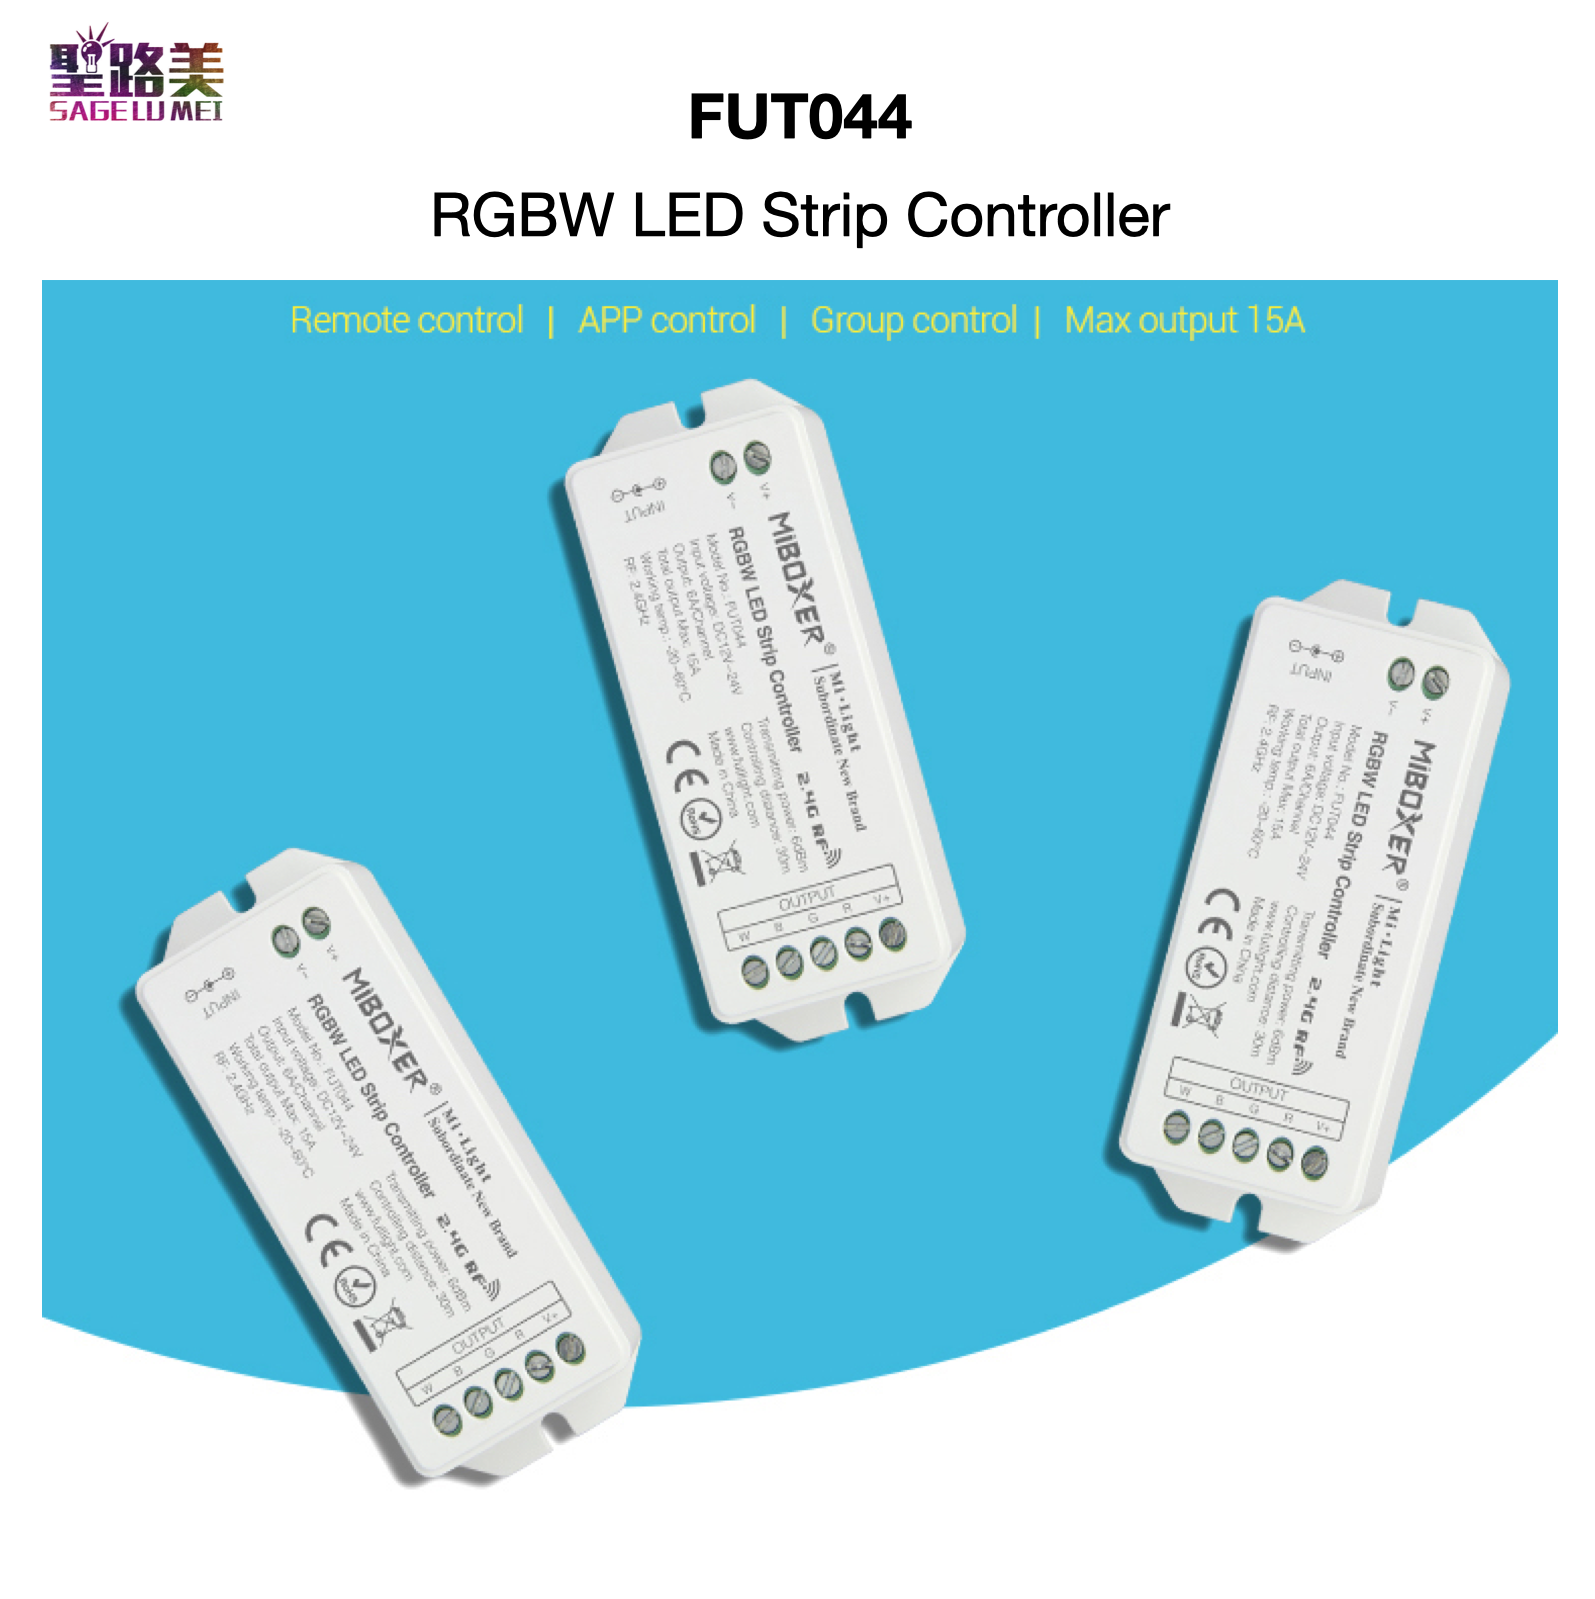 FUT044 RGBW LED Strip Controller APP / 2.4GHz Remote RF / Group Control Auto-synchronization Auto-transmitting MiBOXER Mi-Light